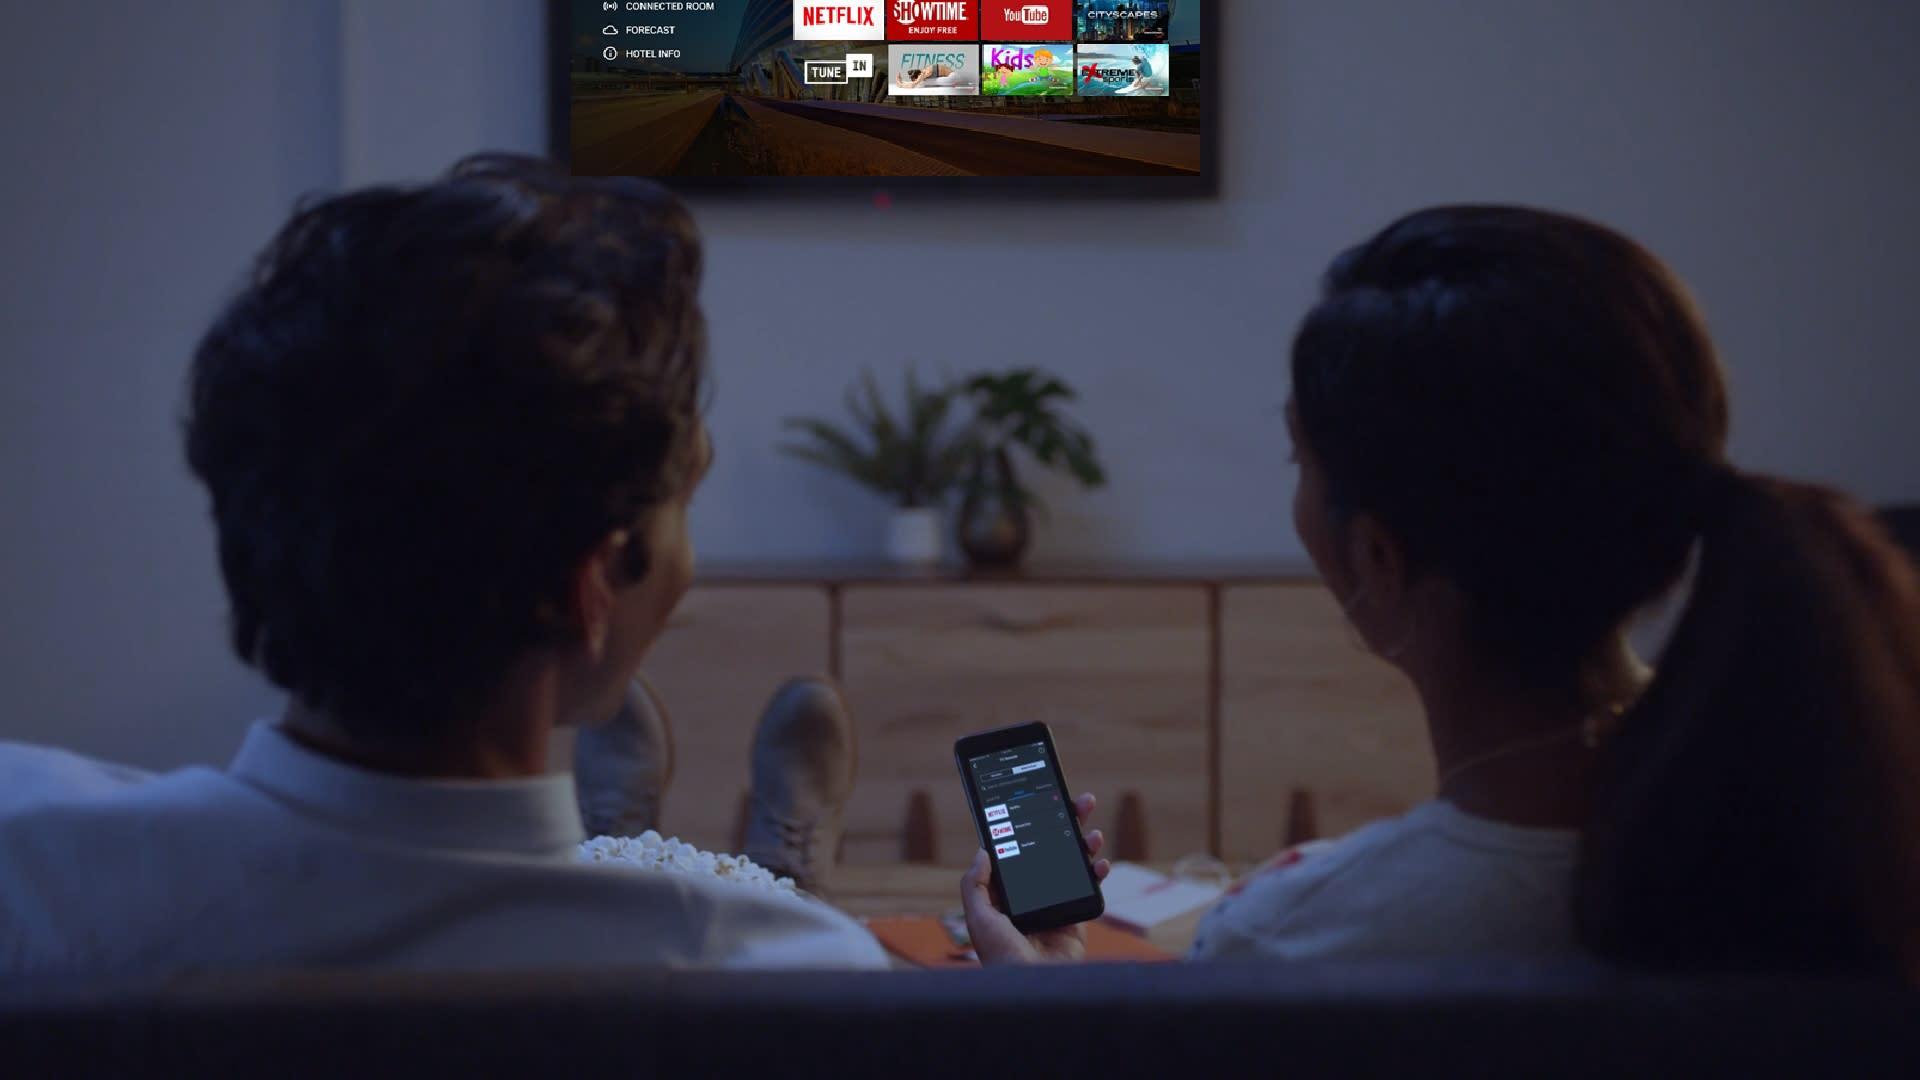 Netflix to scale down European network traffic after EU pressure